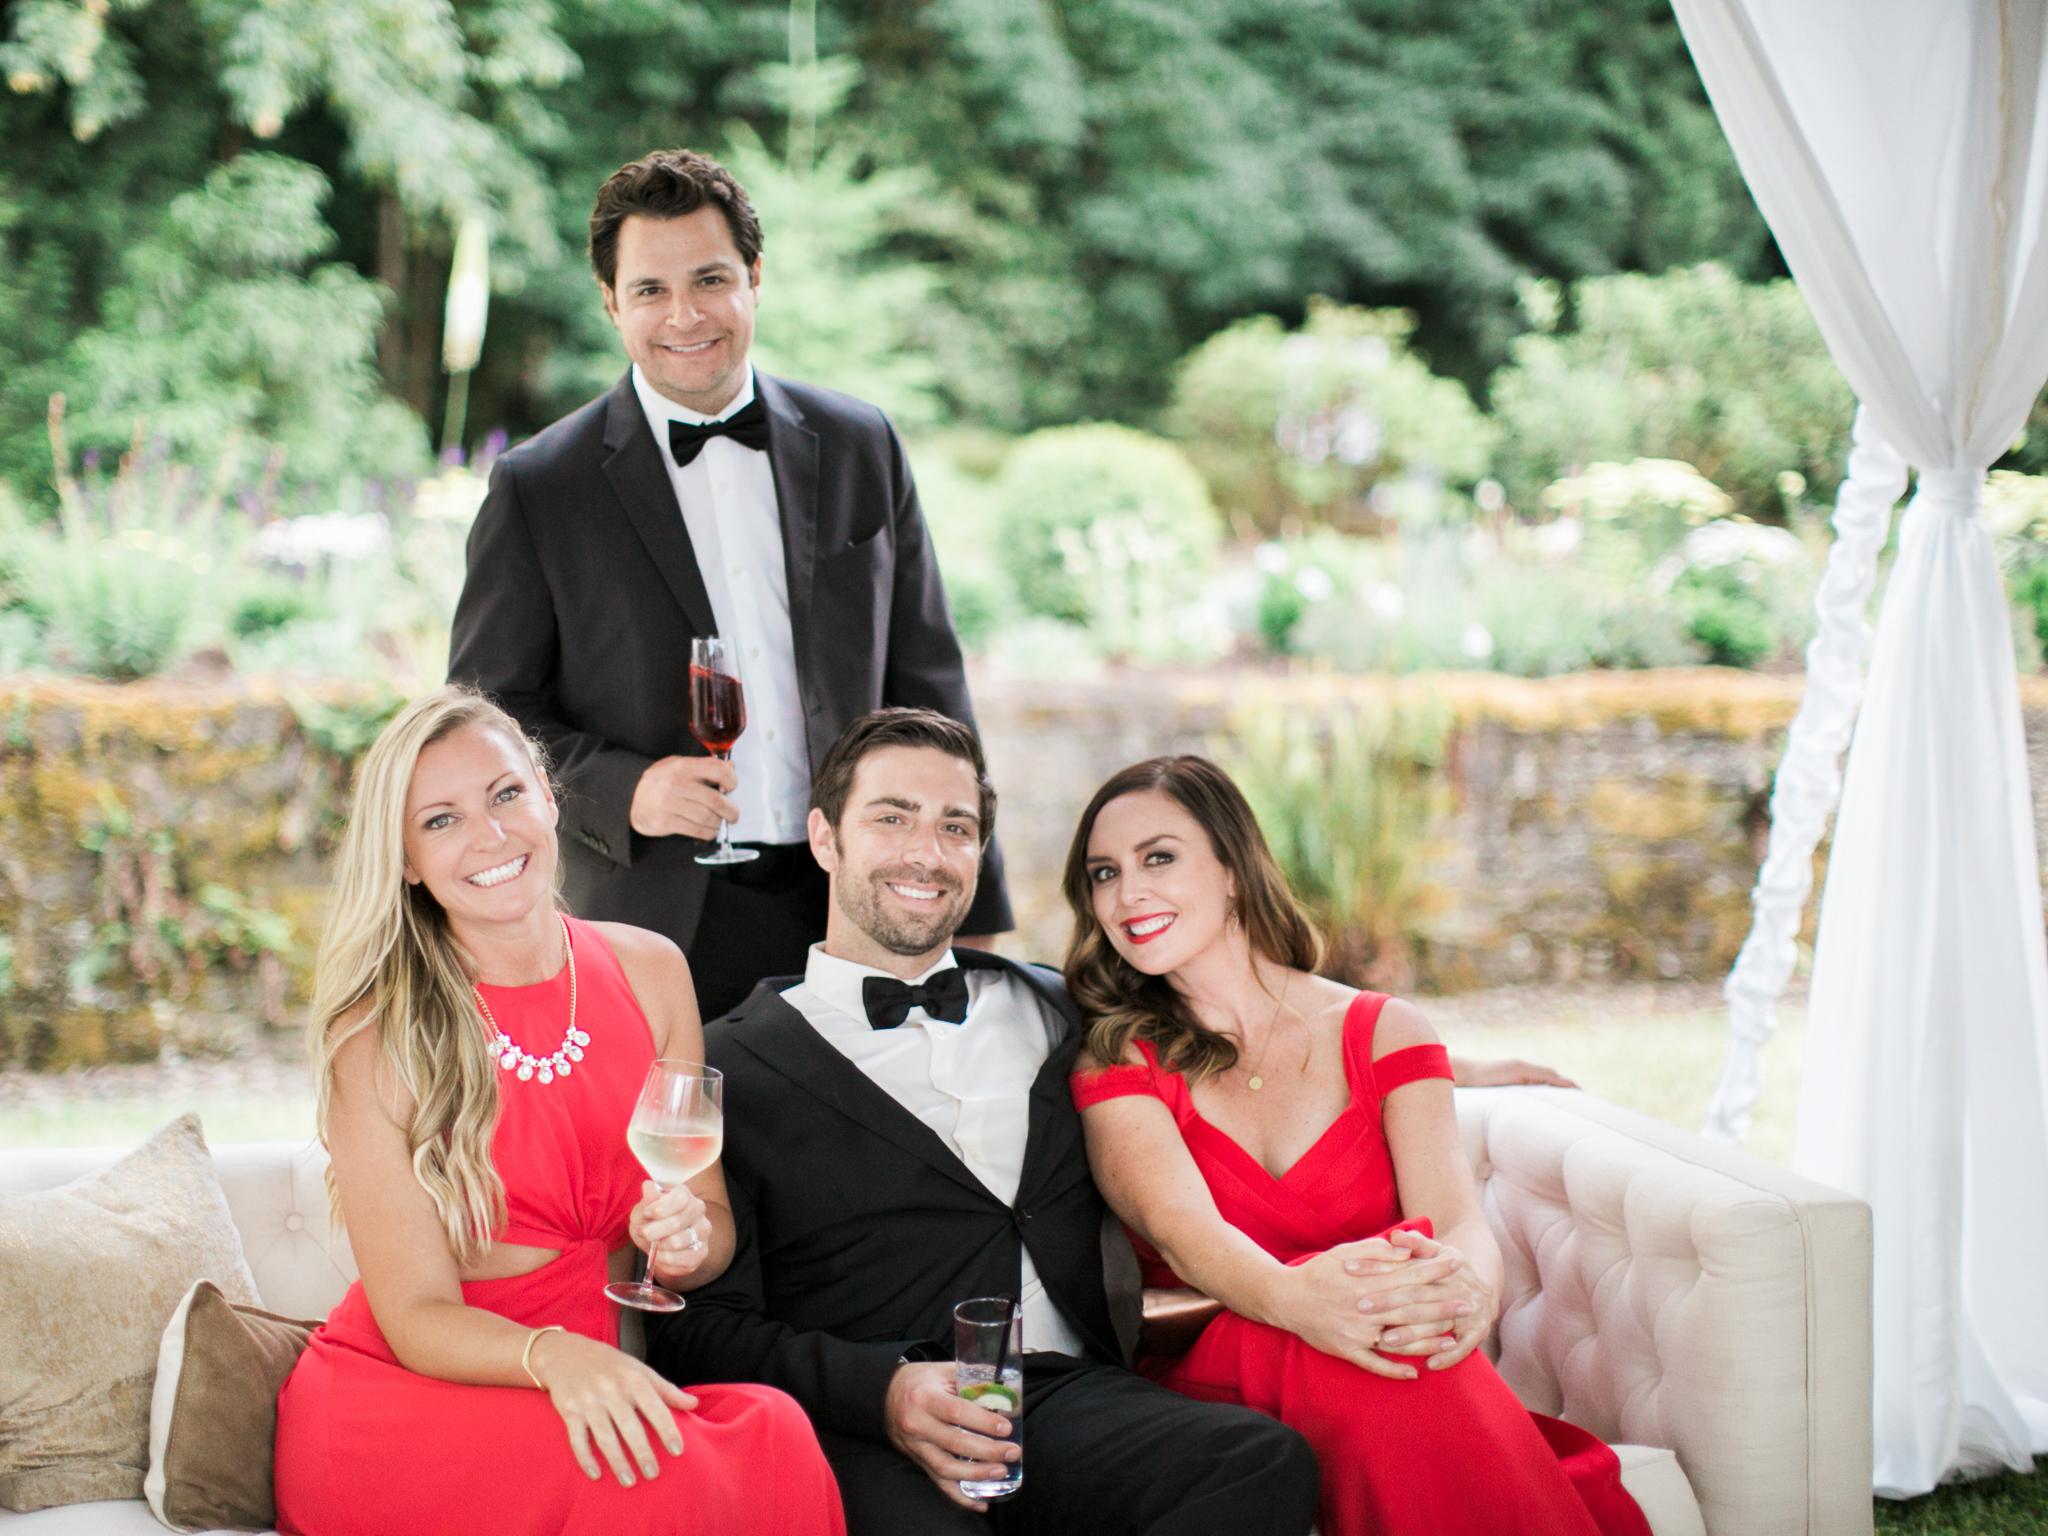 196OutliveCreative_Travel_Photographer_Videographer_Lewis&Clark_Oregon_Elegant_BlackTie_Destination_Wedding.jpg